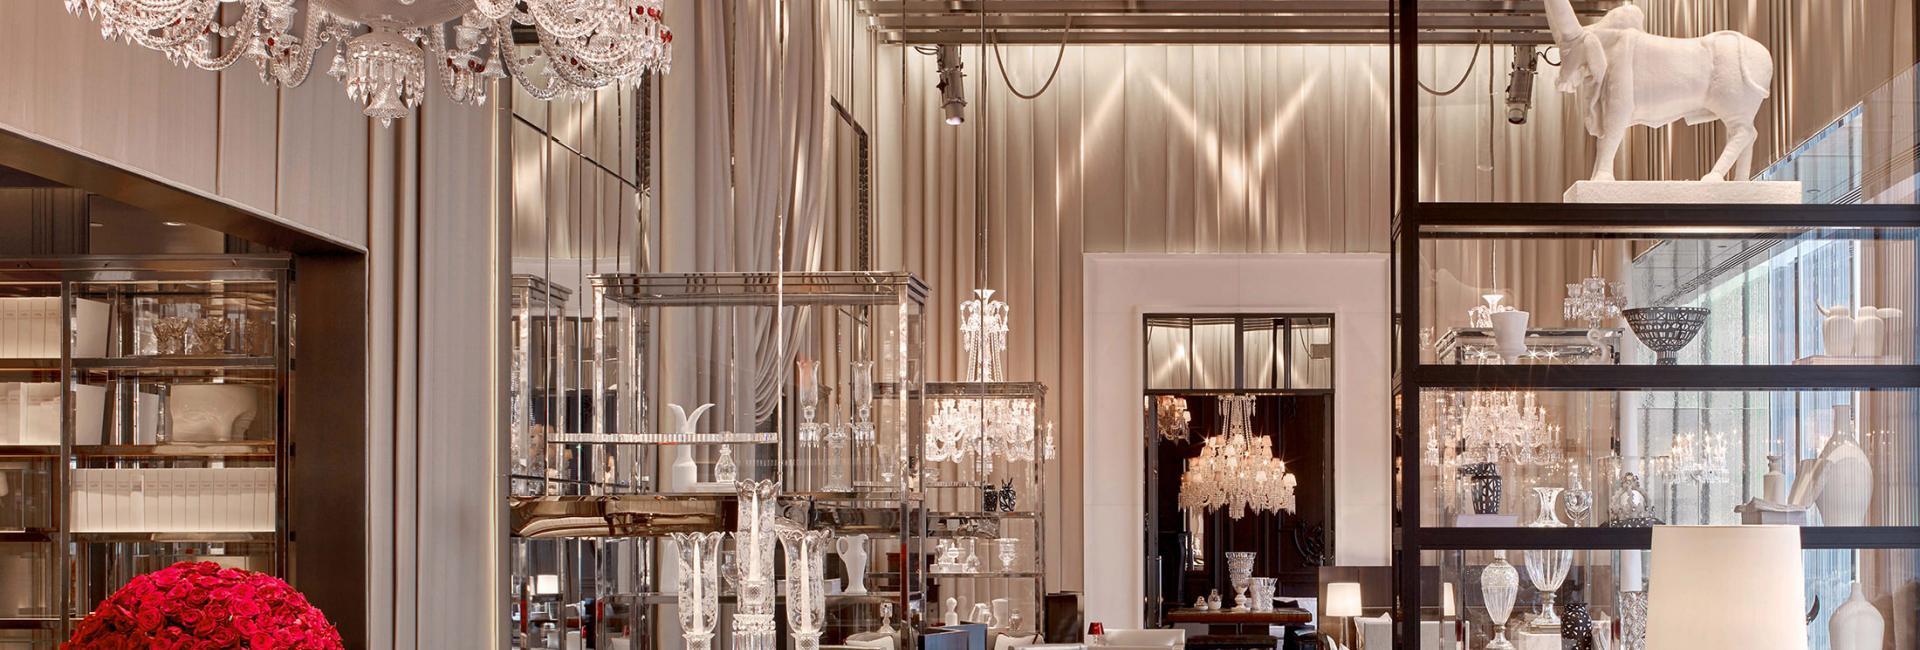 grand salon at baccarat hotel